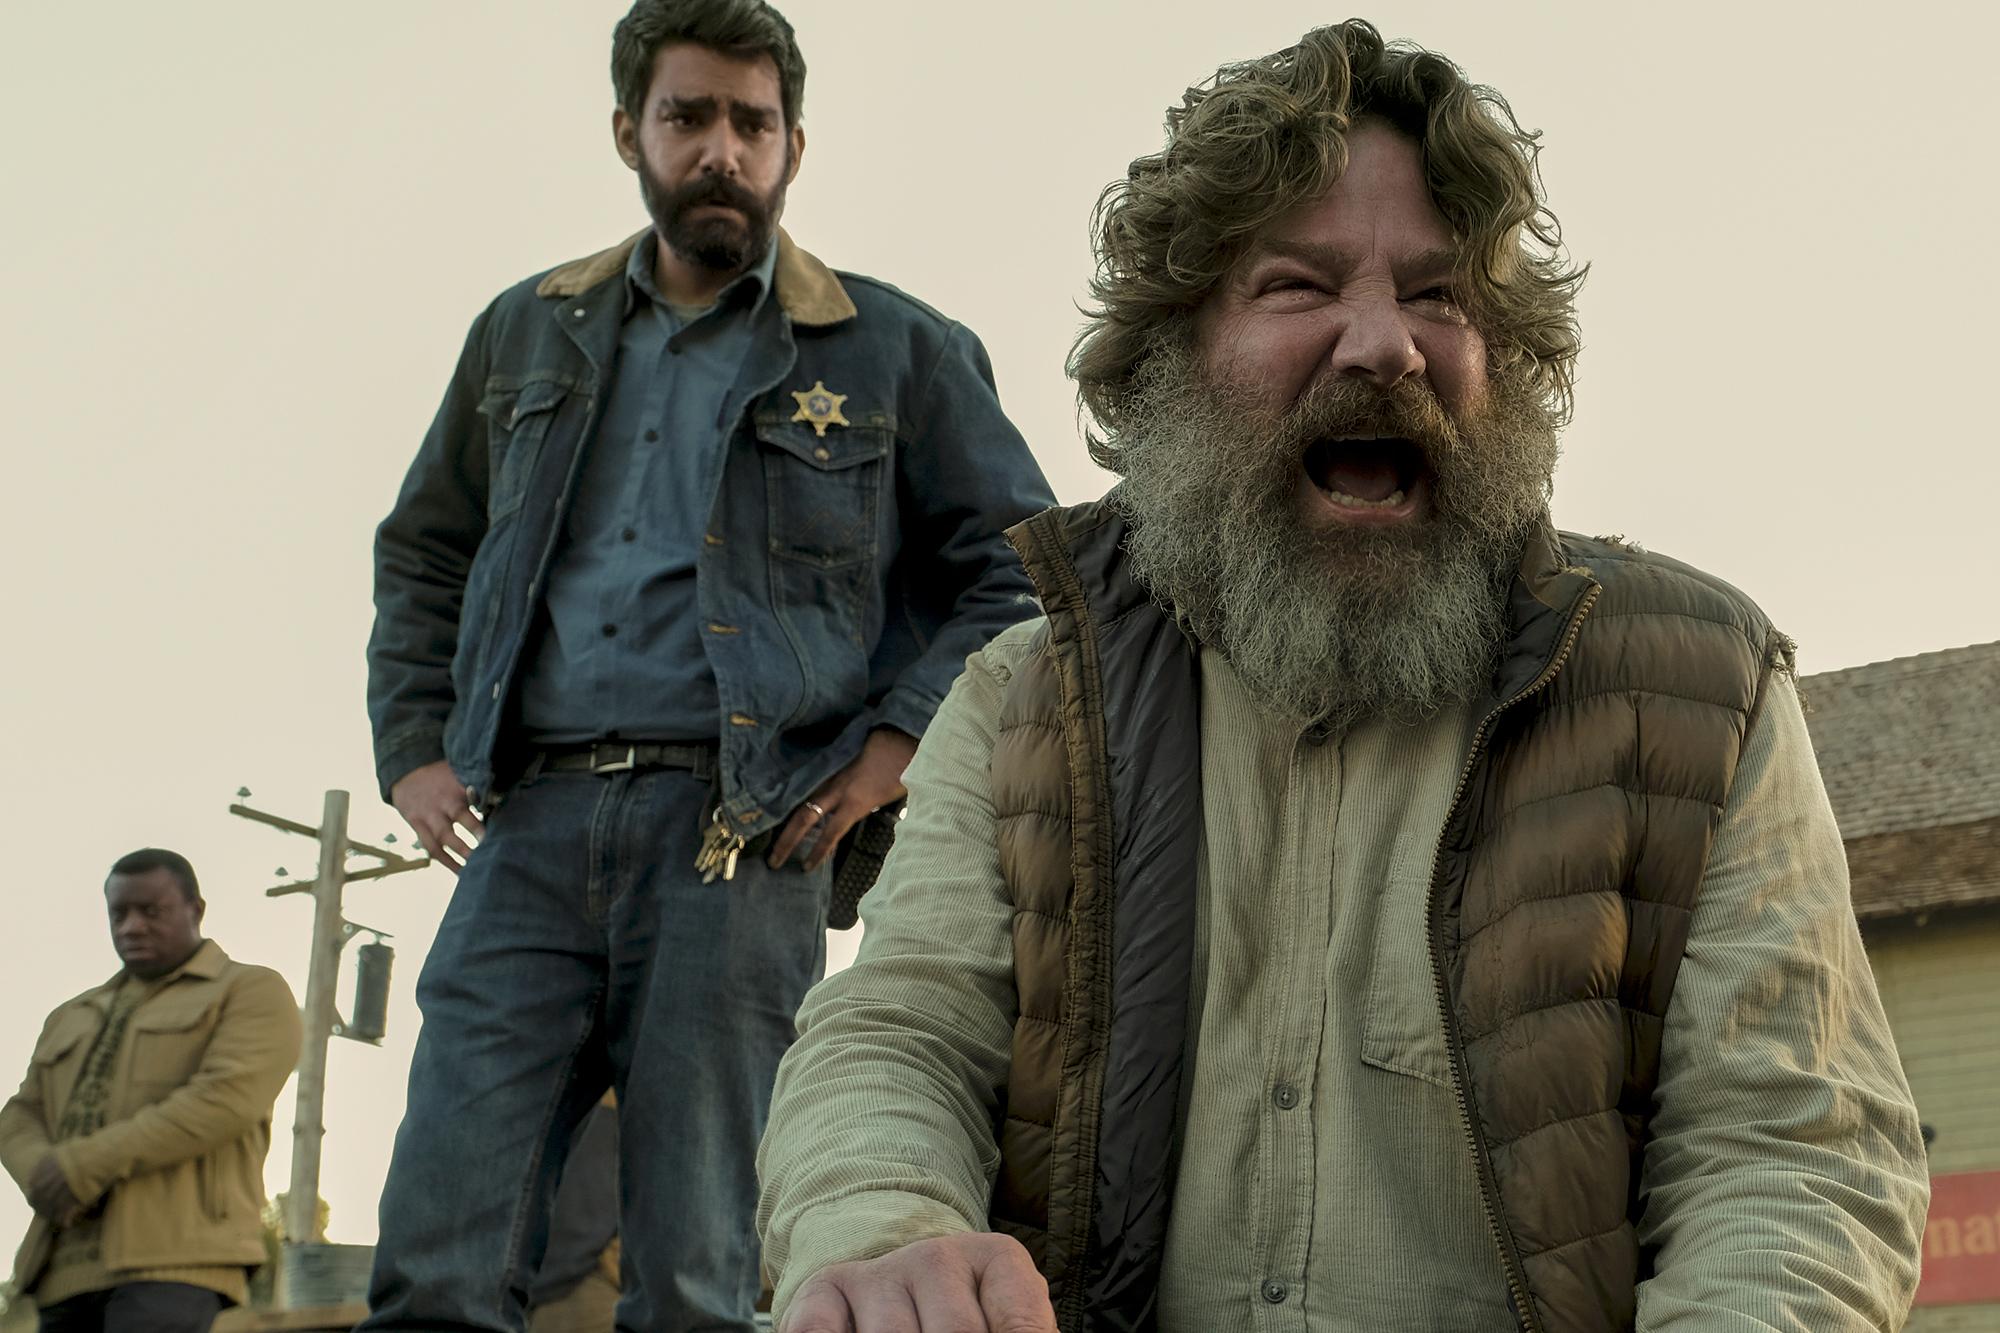 MIDNIGHT MASS (L to R) RAHUL KOHLI as SHERIFF HASSAN and MATT BIEDEL as STURGE in episode 102 of MIDNIGHT MASS